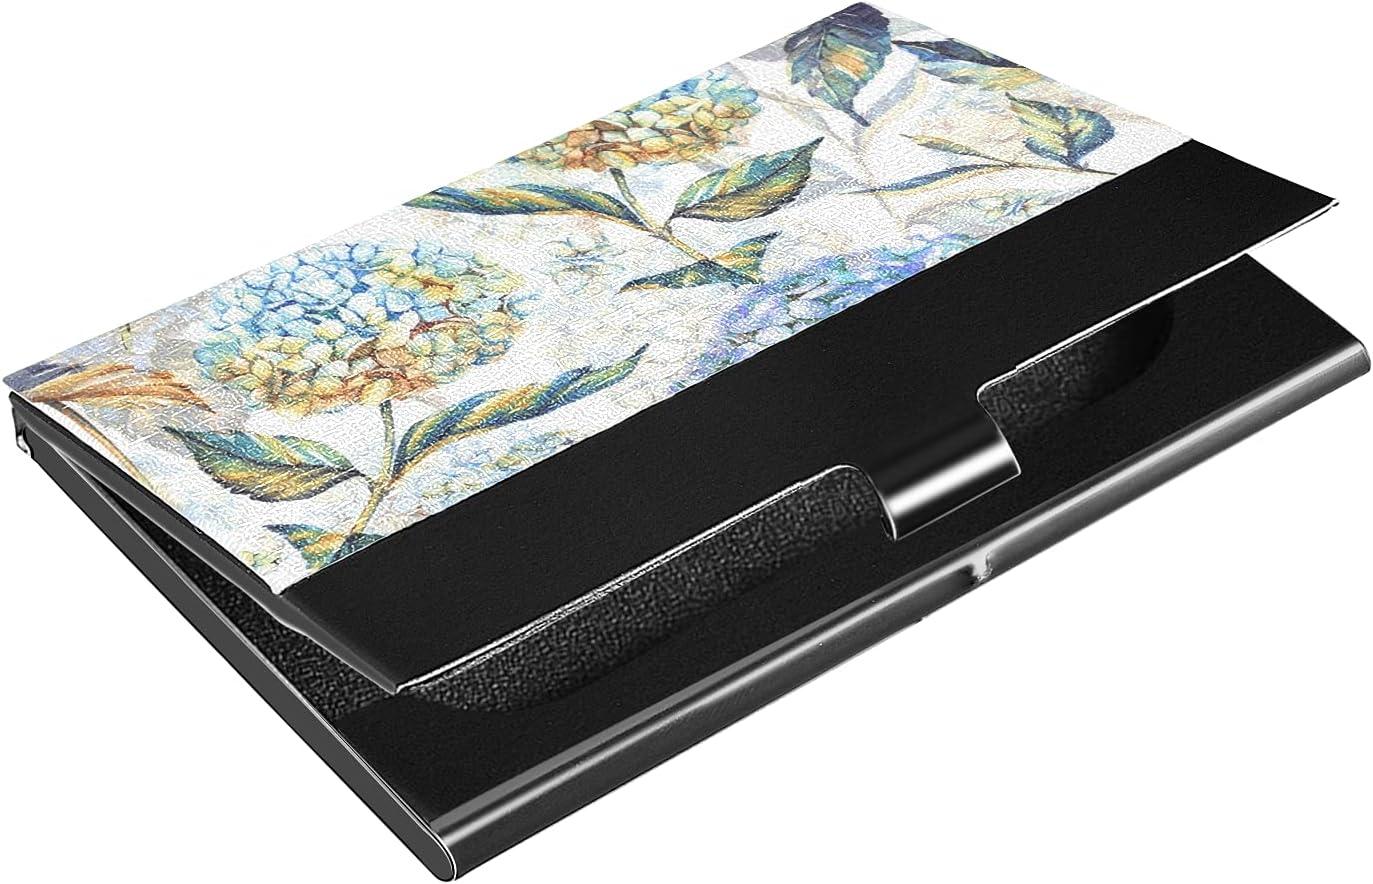 Financial sales sale OFFicial site OTVEE Vintage Blue Hydrangea Business Holder Wallet Stainle Card